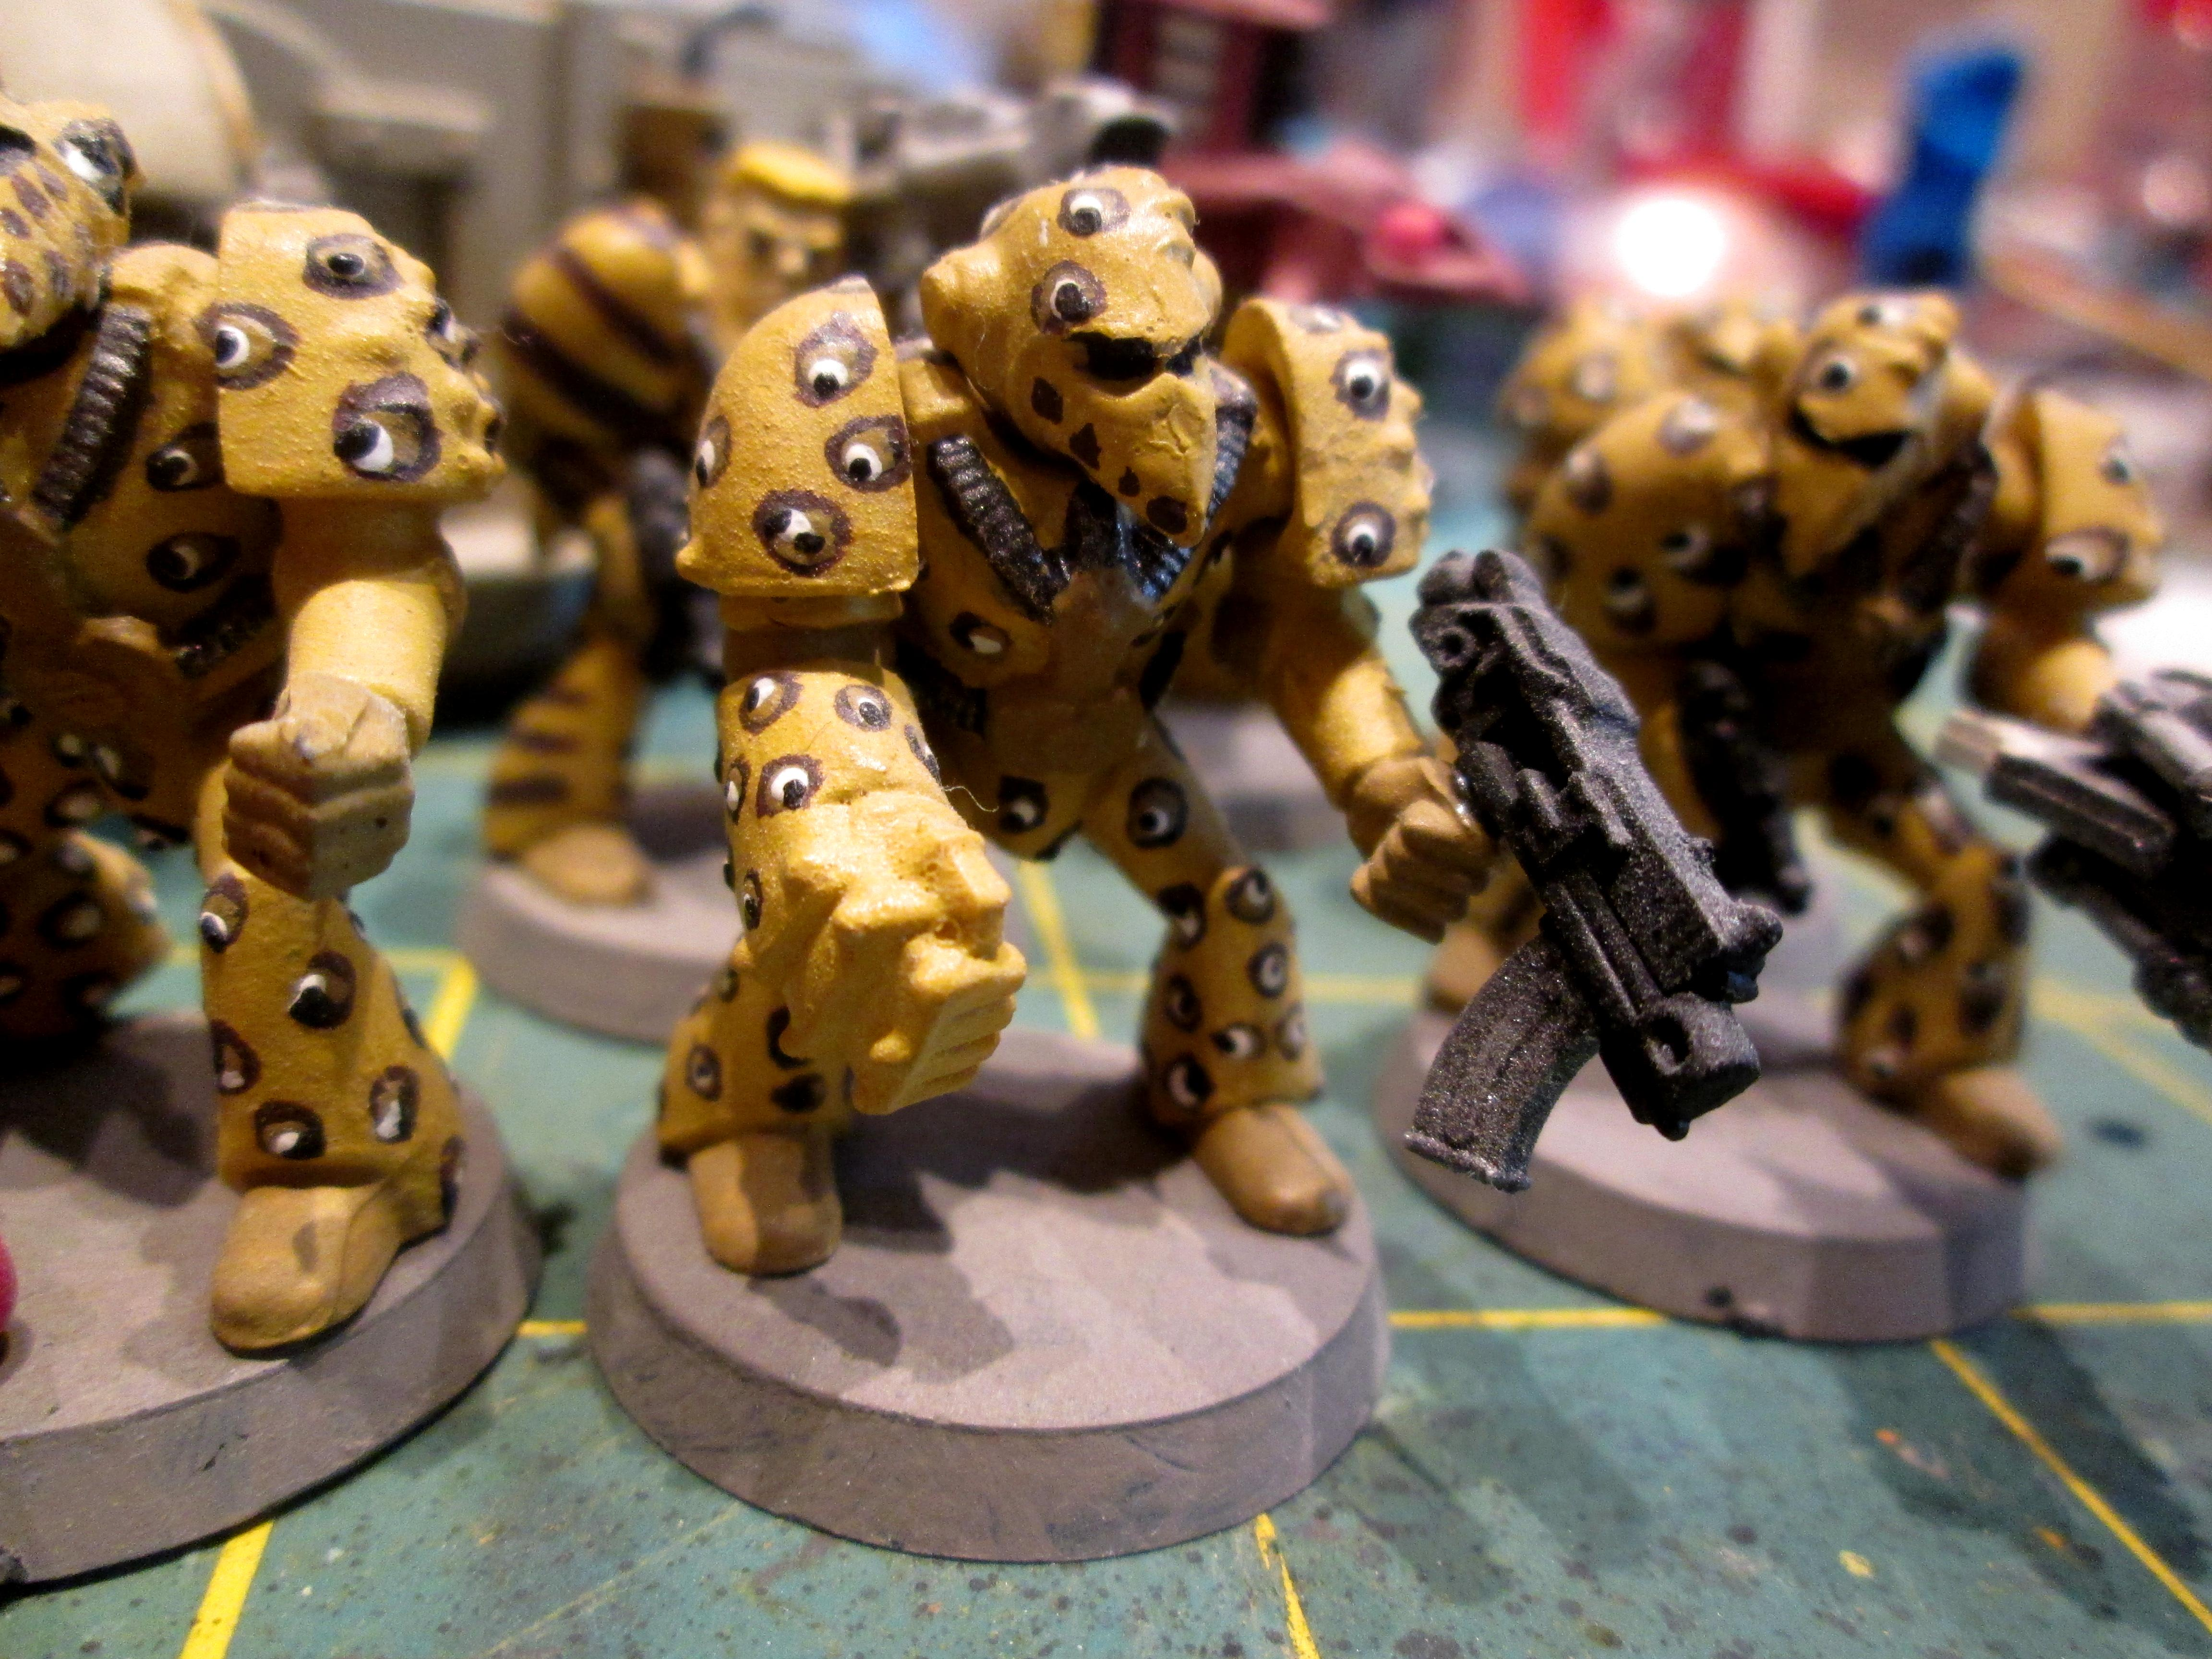 Beakies, Imperial Guard, Rogue Trader, Space Marines, Warhammer 40,000